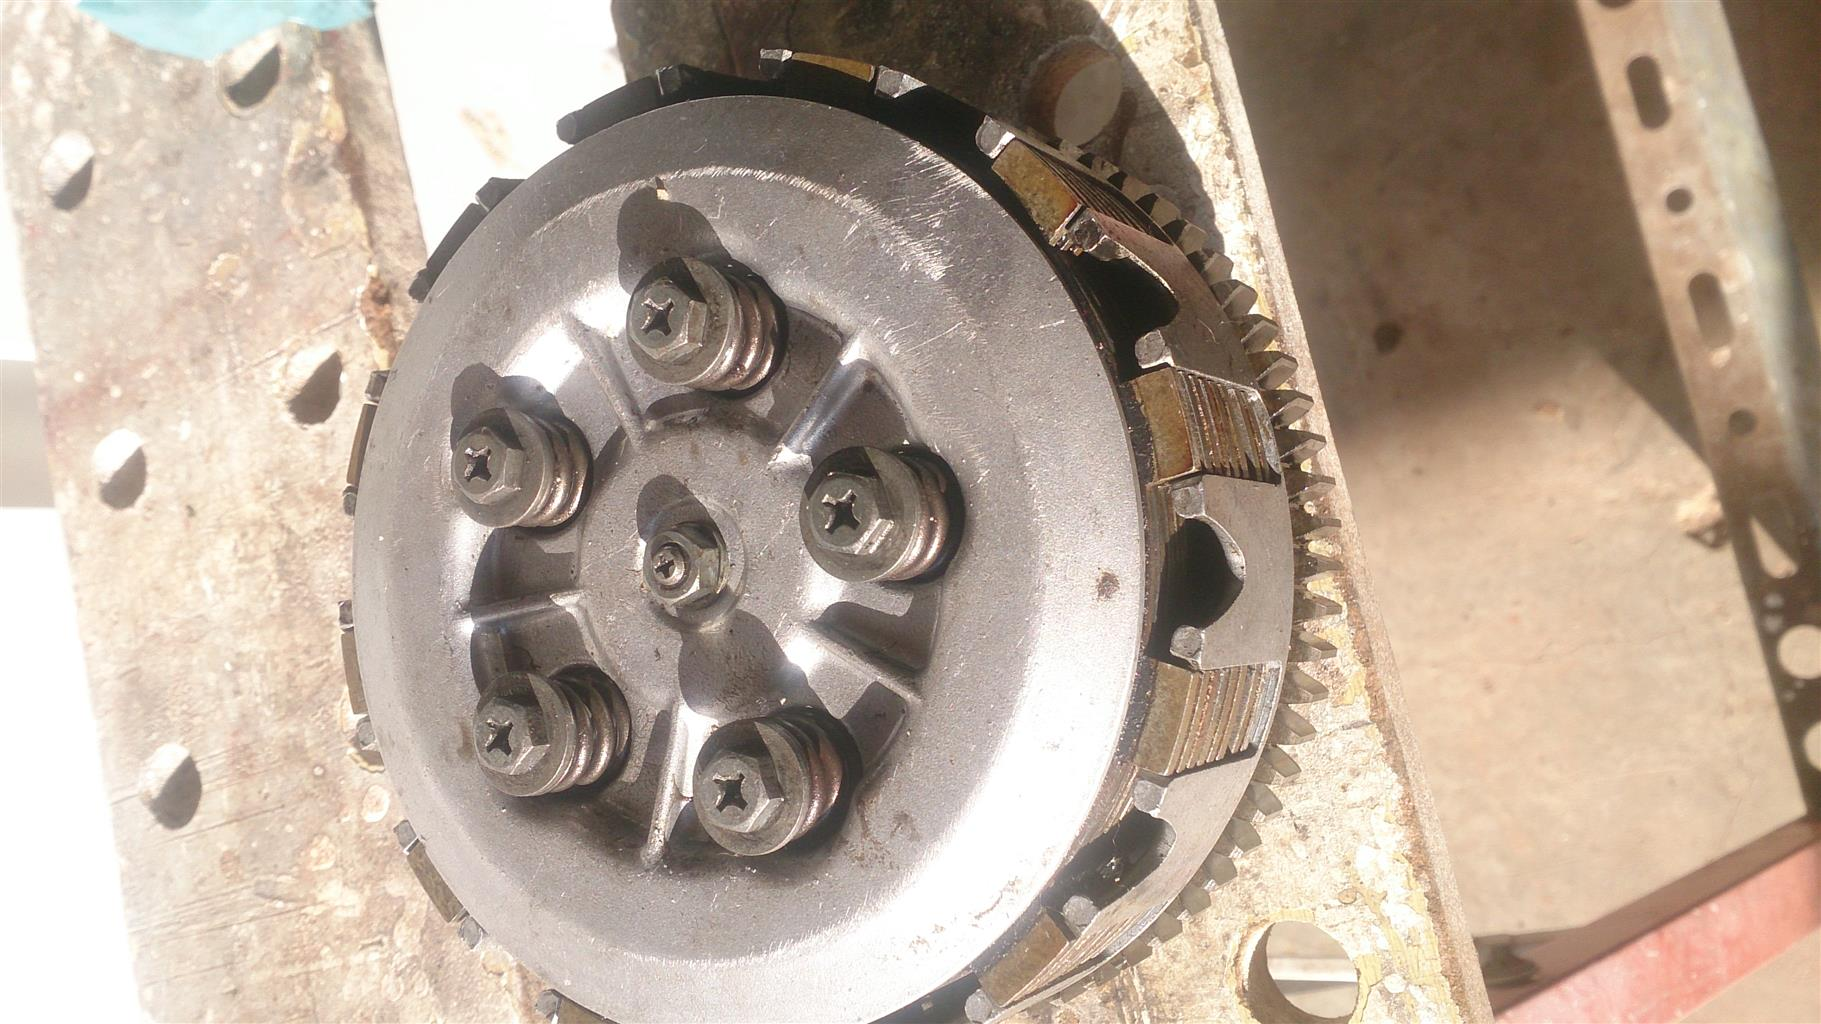 Xt600 complete clutch assy